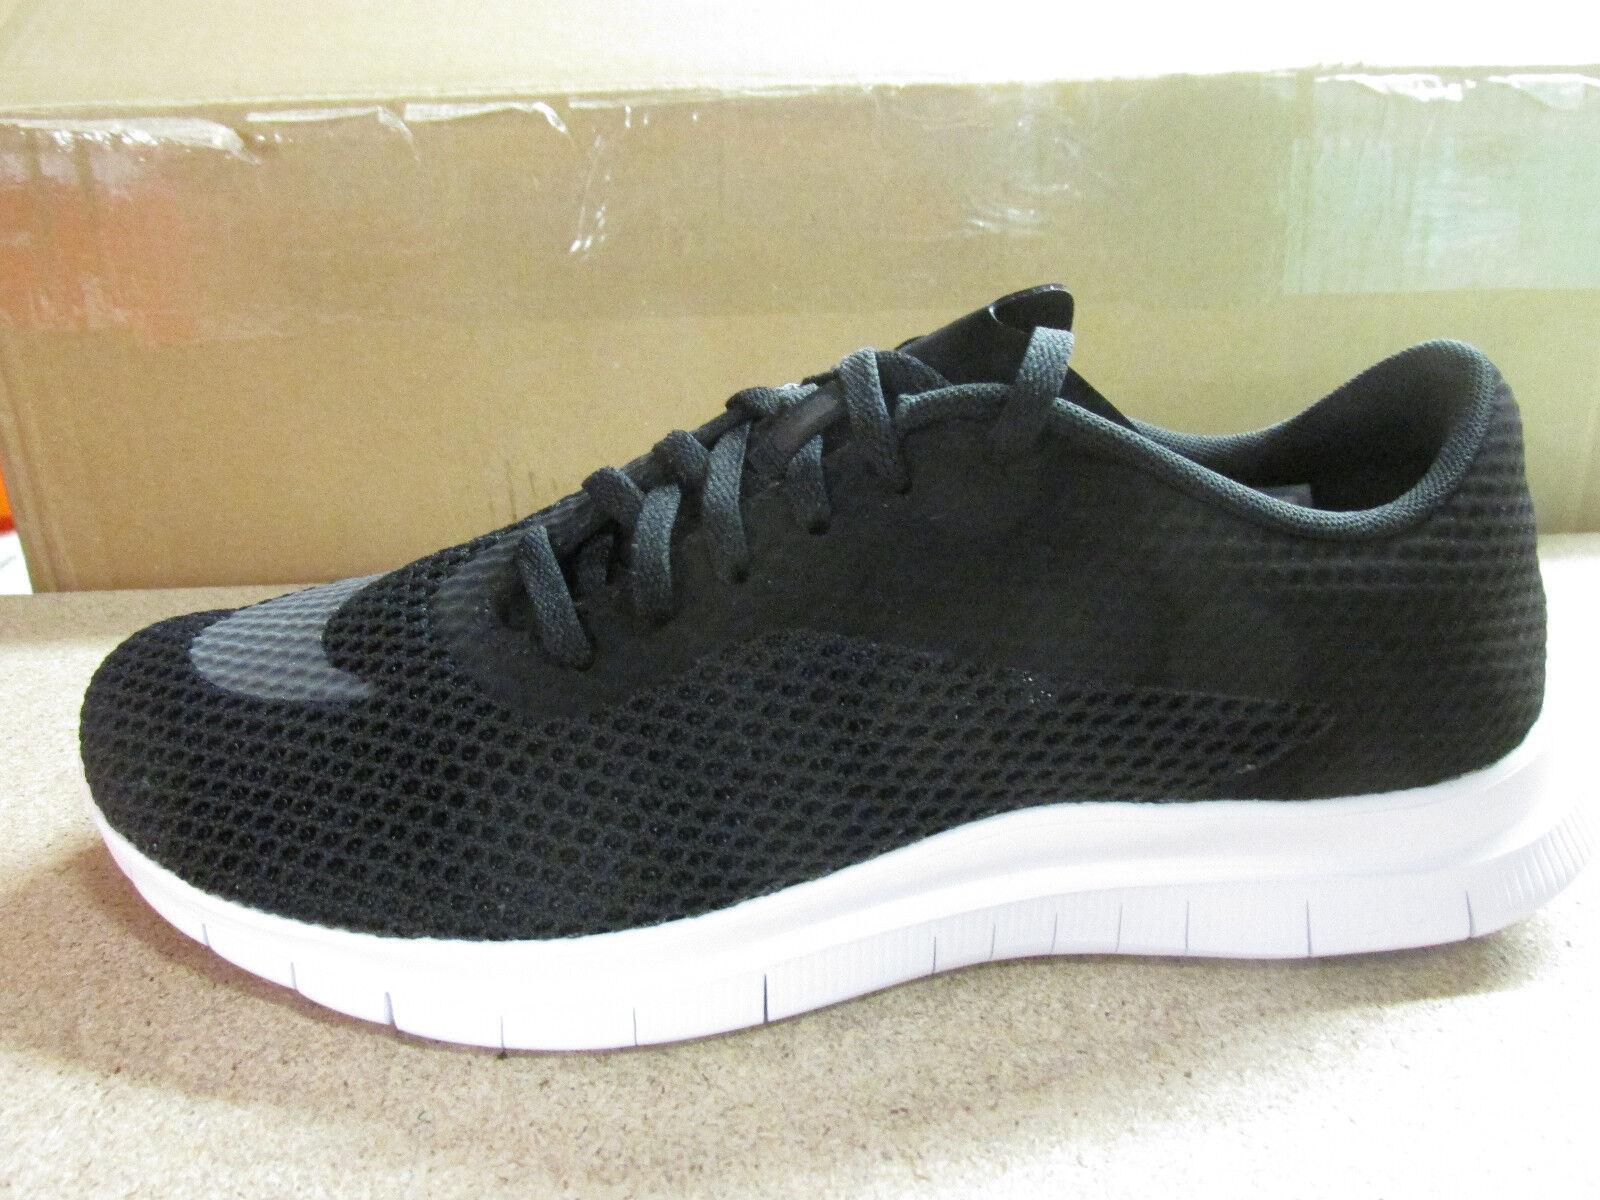 Nike Free Hypervenom Basse Scarpe Sportive Uomo 725125 725125 725125 009 Scarpe da Tennis | Moda  | Uomini/Donna Scarpa  2f18ab